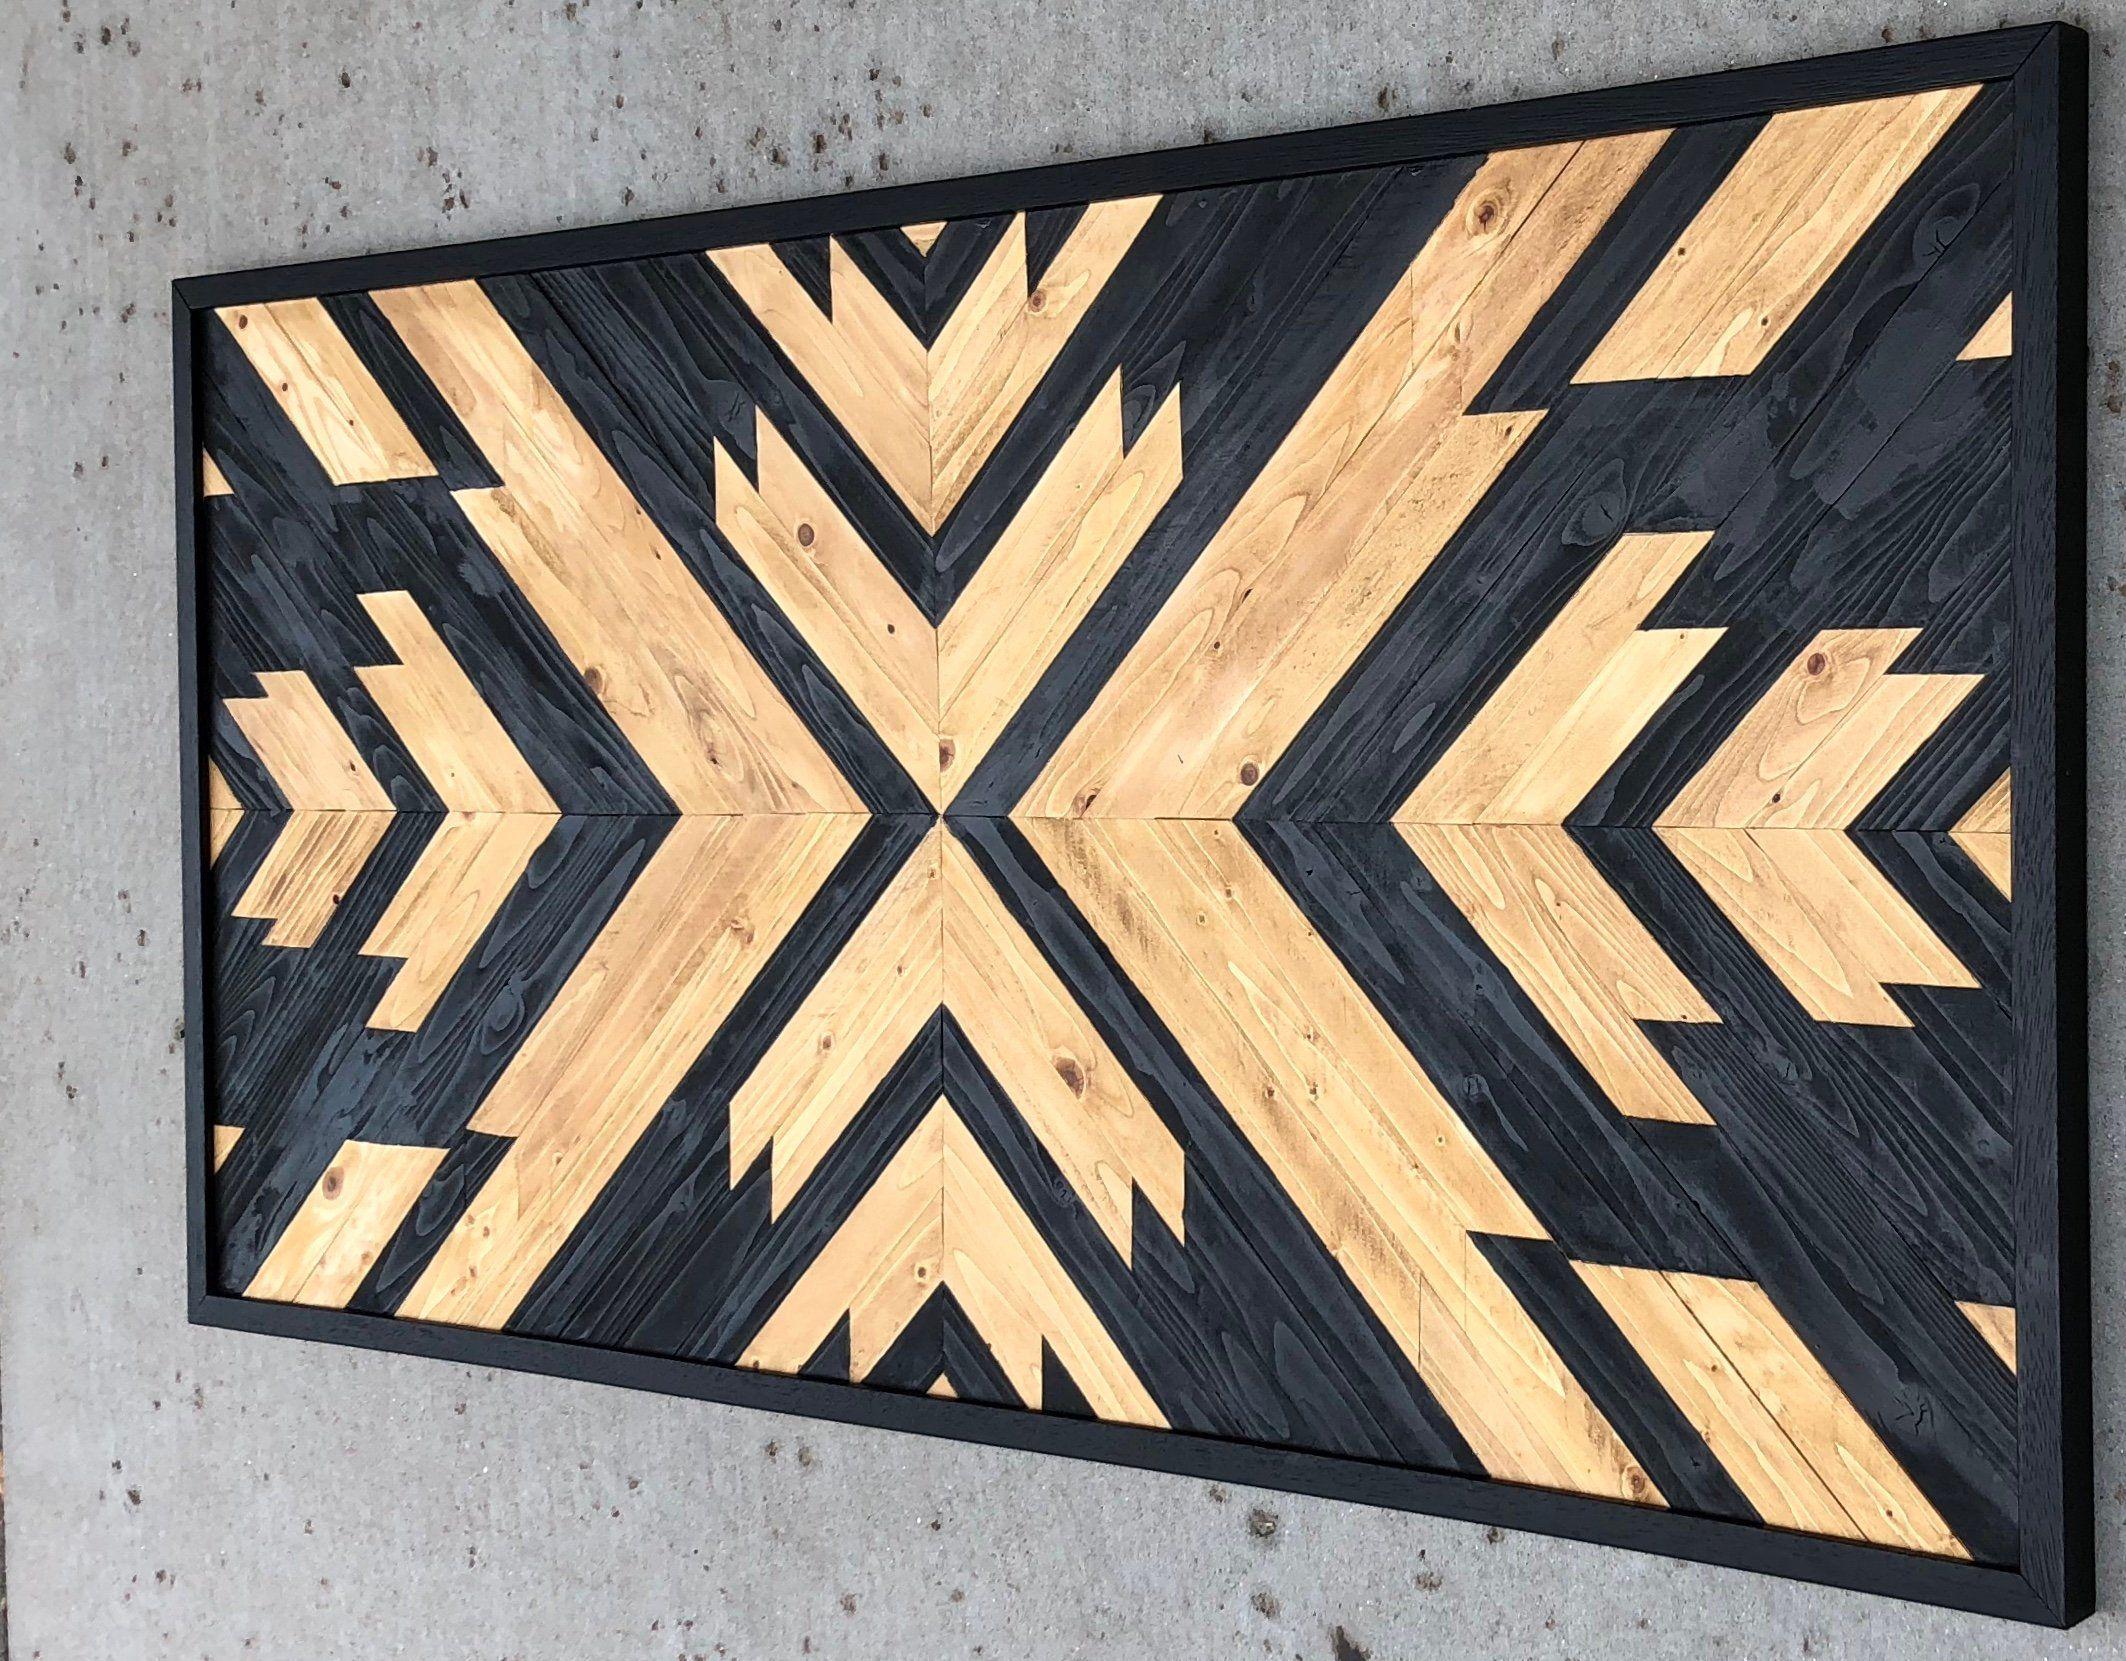 Wood wall art reclaimed wood wall decor wood art modern wall